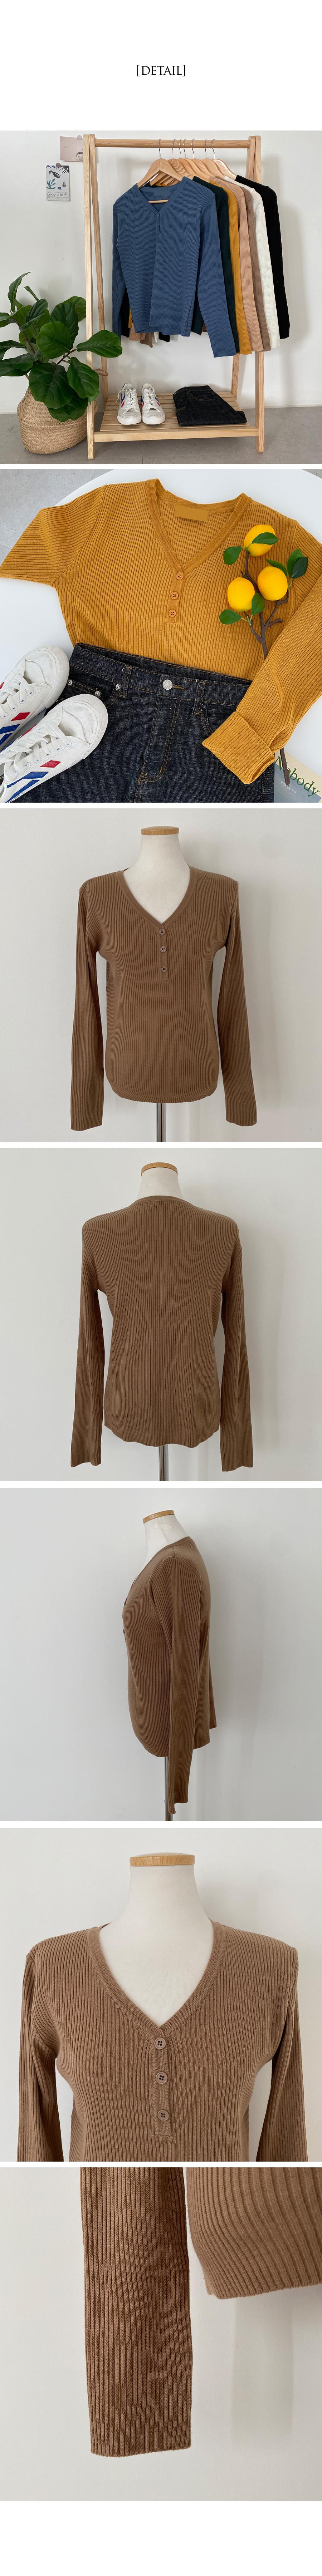 Fiat Ribbed Button V-Neck Knitwear